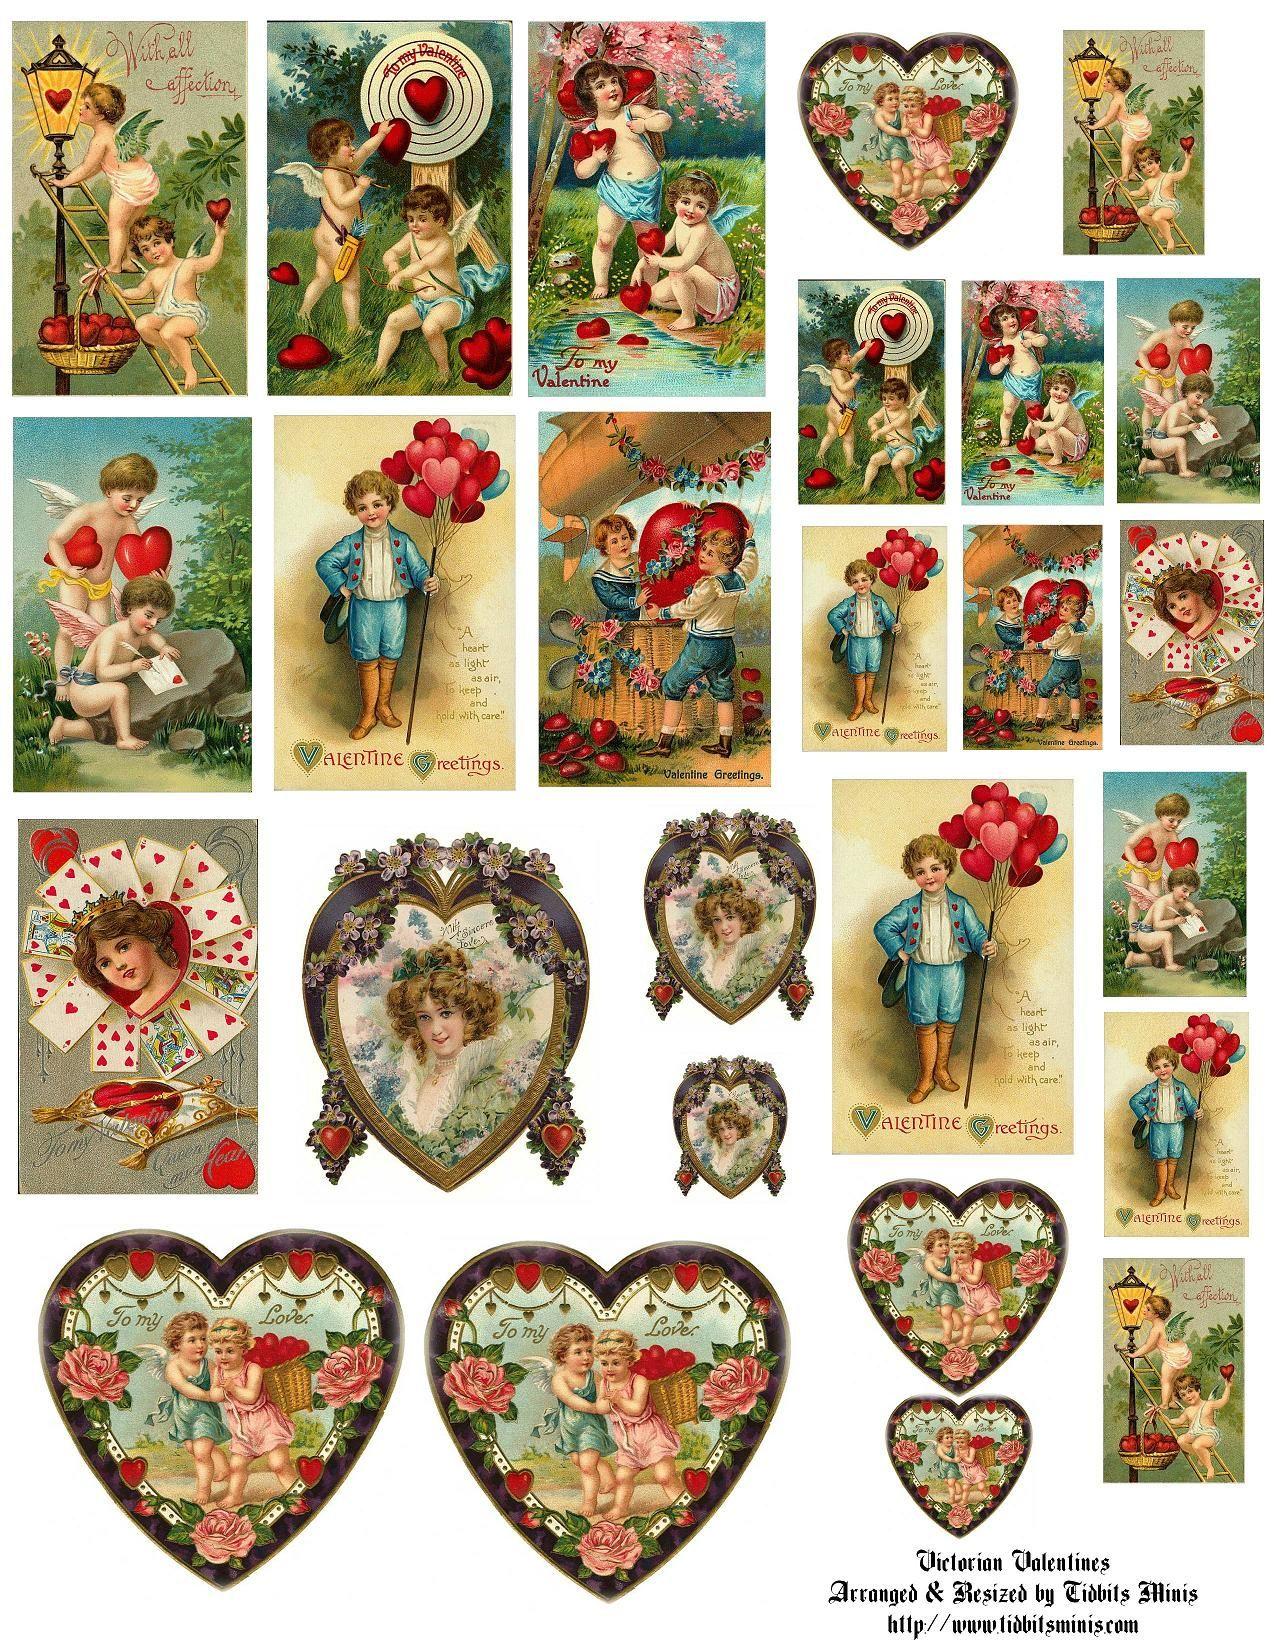 10 Cherub Angel Heart Die Cut Embellishment Cutout Valentine Scrapbook Cards